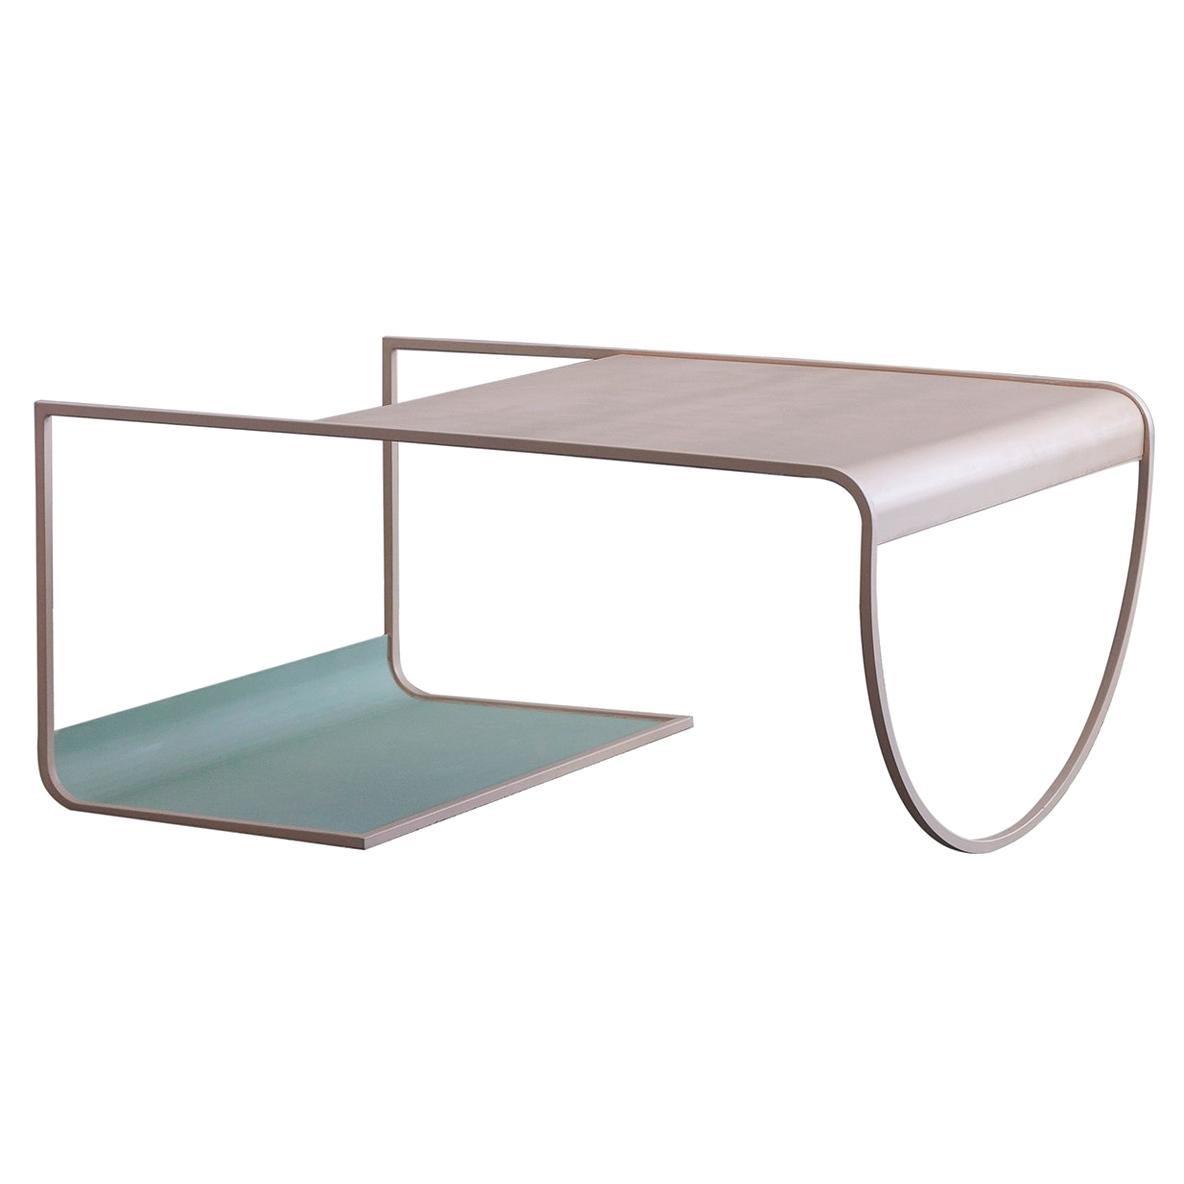 Minimalist SW Coffee Table in Powder-Coated Steel by Soft-Geometry